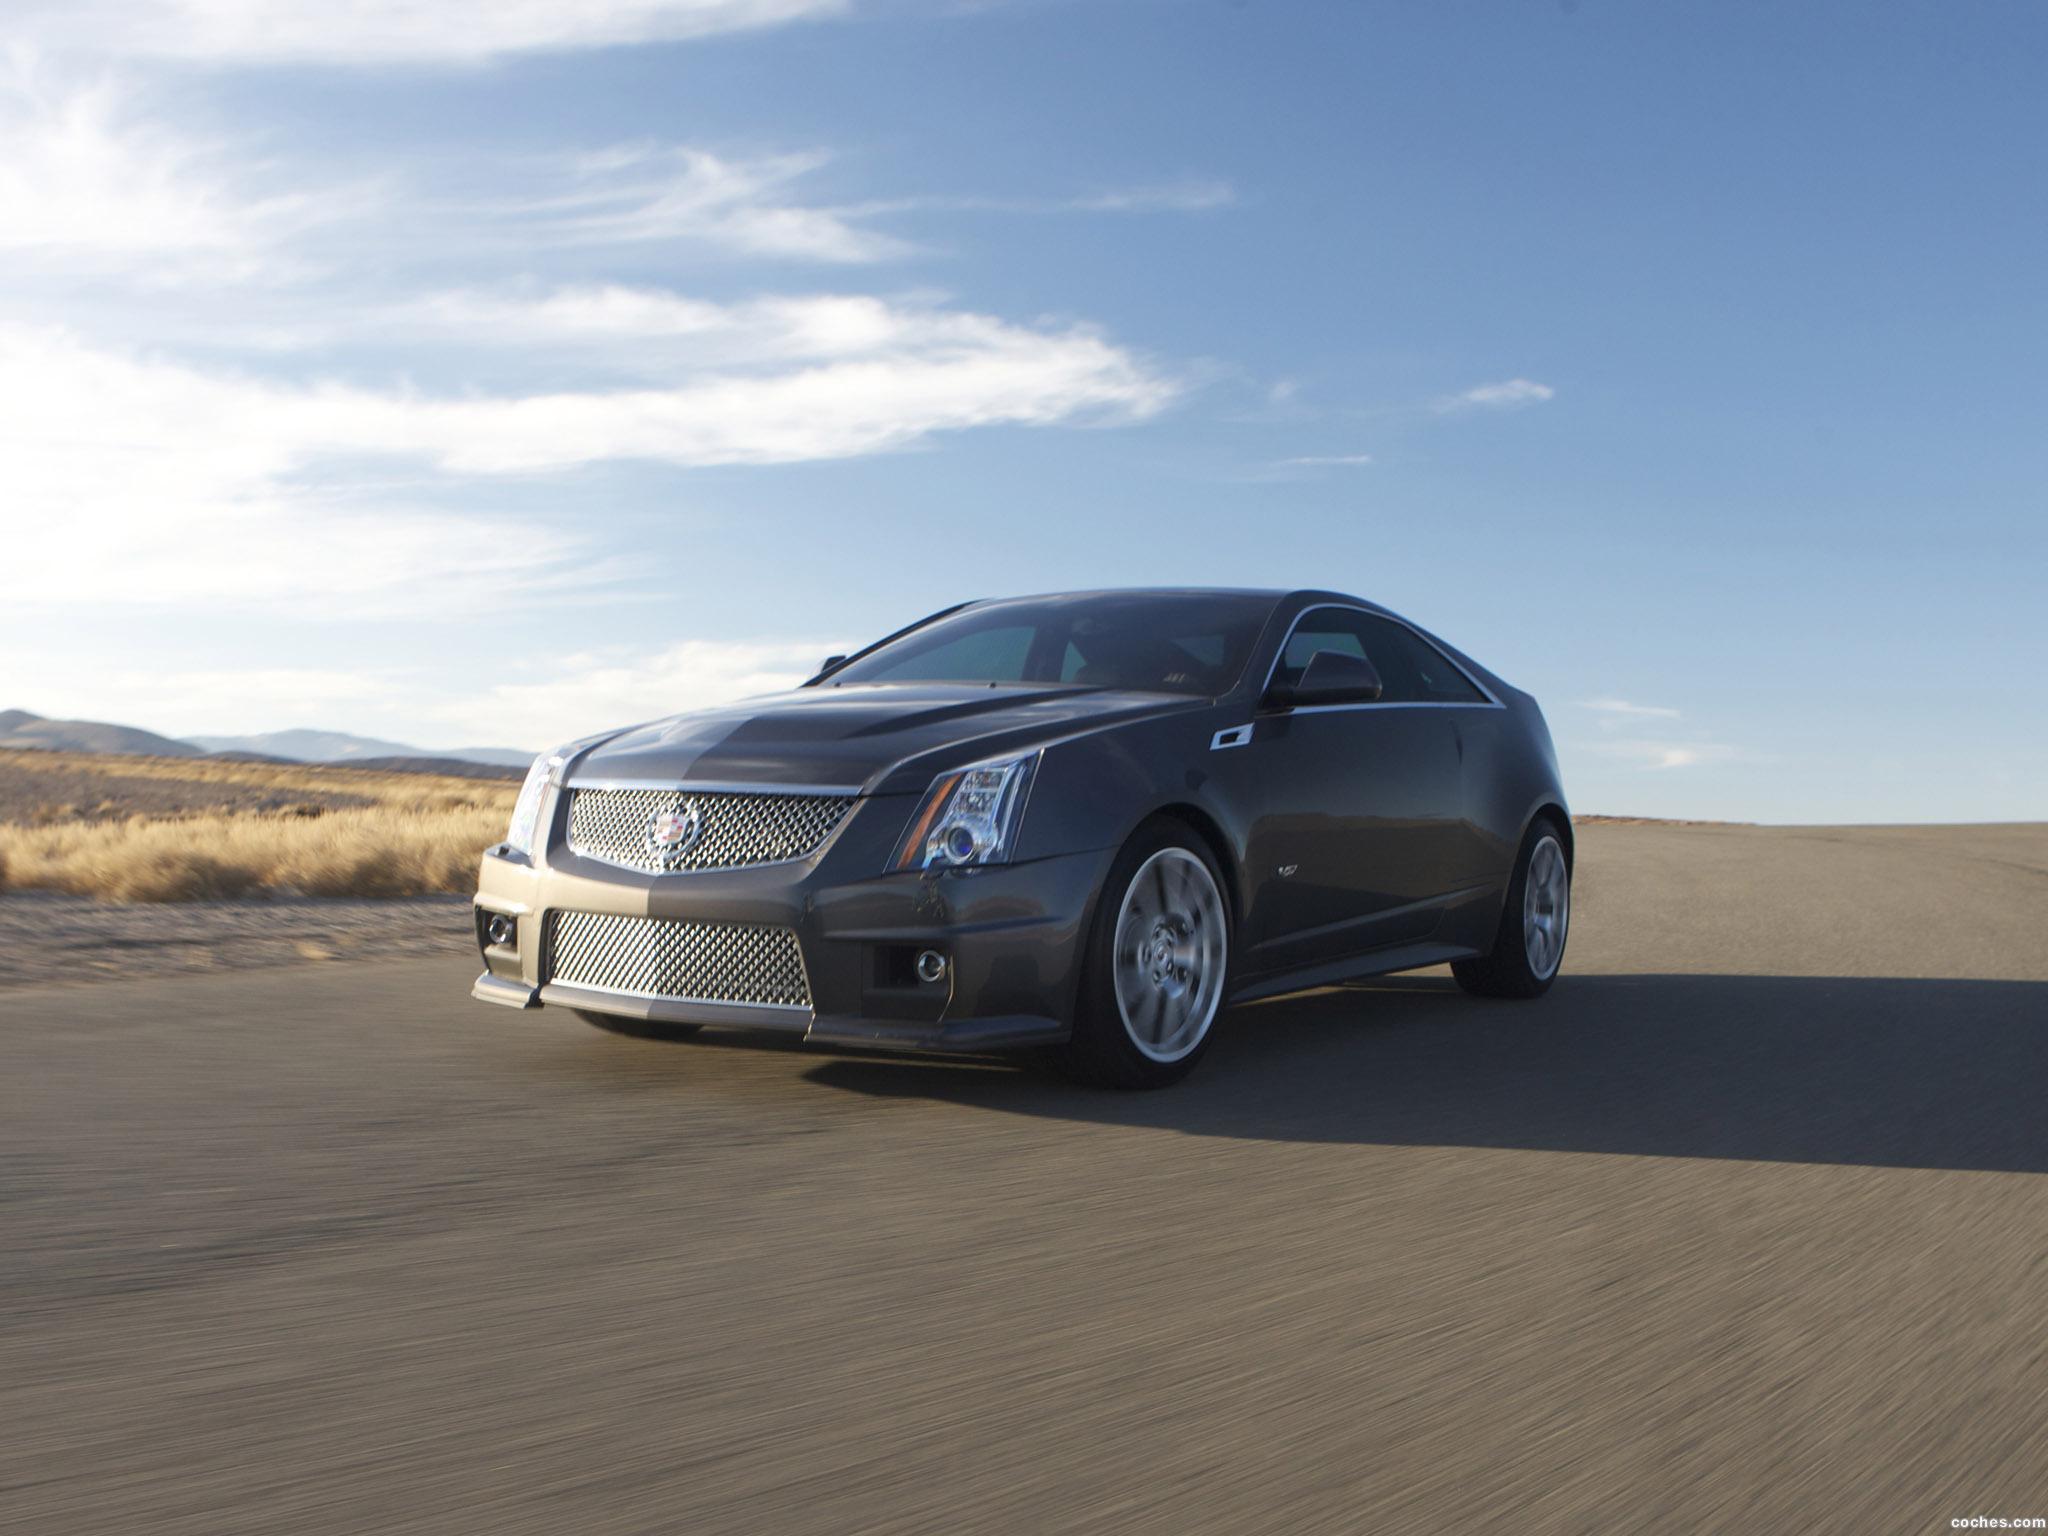 Foto 2 de Cadillac CTS-V Coupe 2011